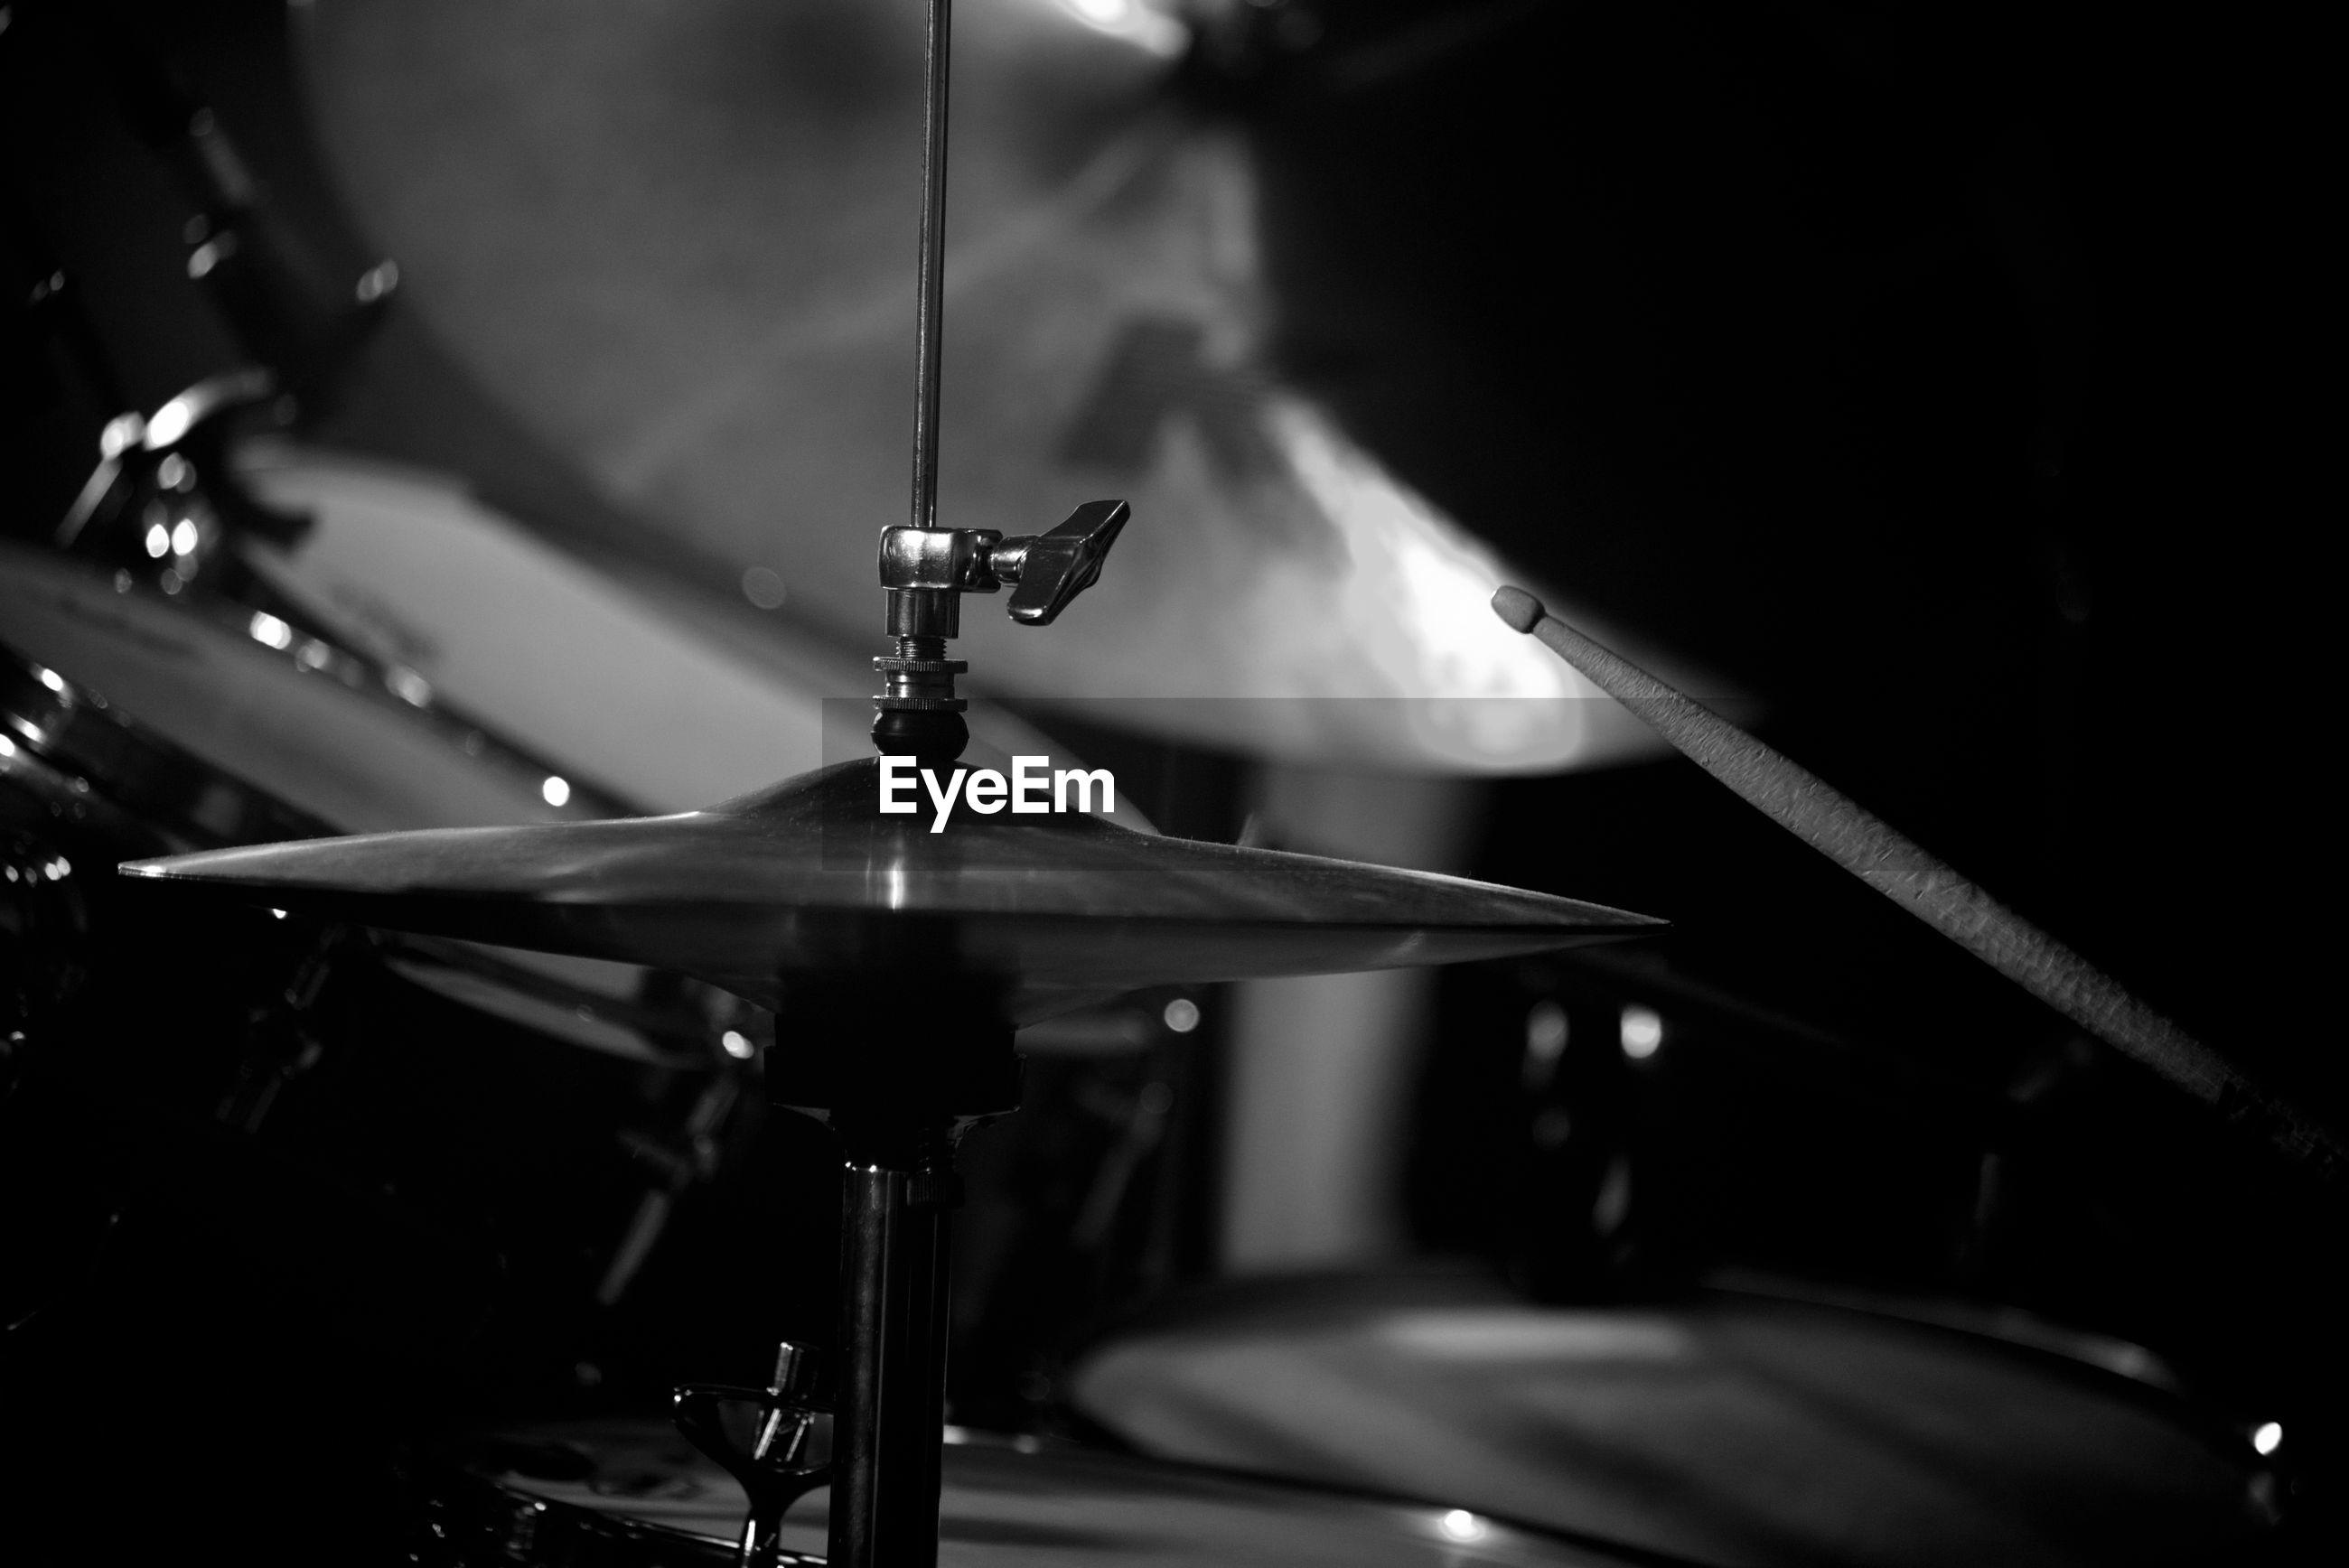 View of musical equipment, drum kit.